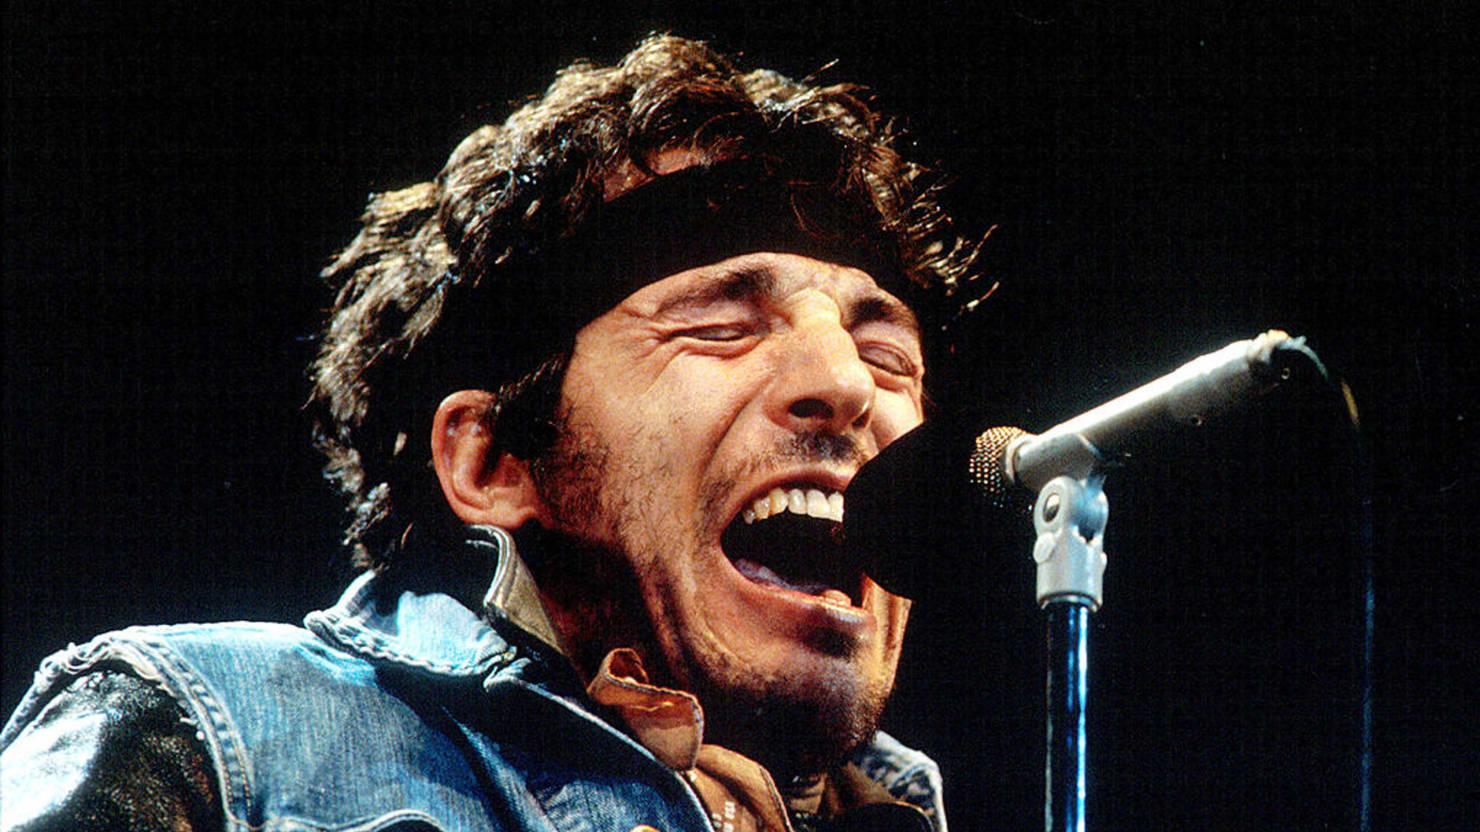 The Best Bruce Springsteen Songs You've Never Heard